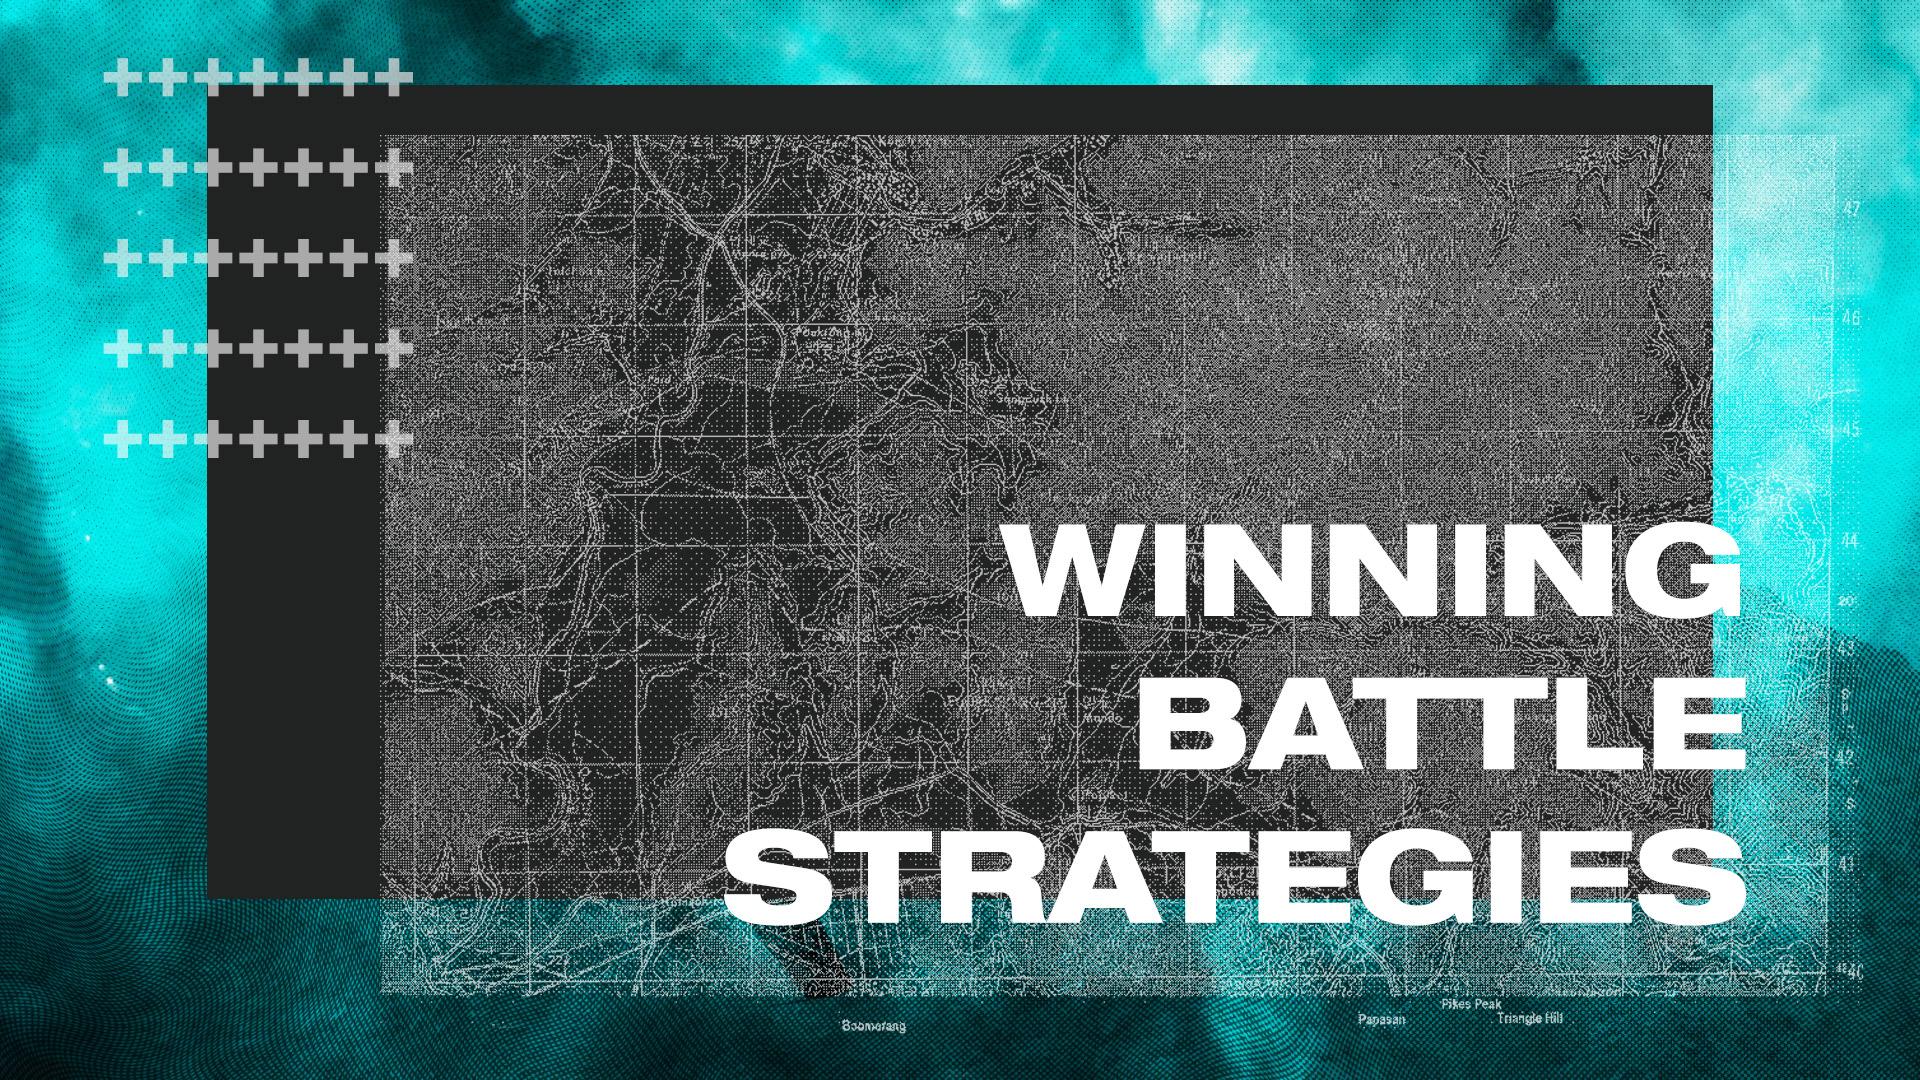 series-battlewinningstrats-thumb.jpg